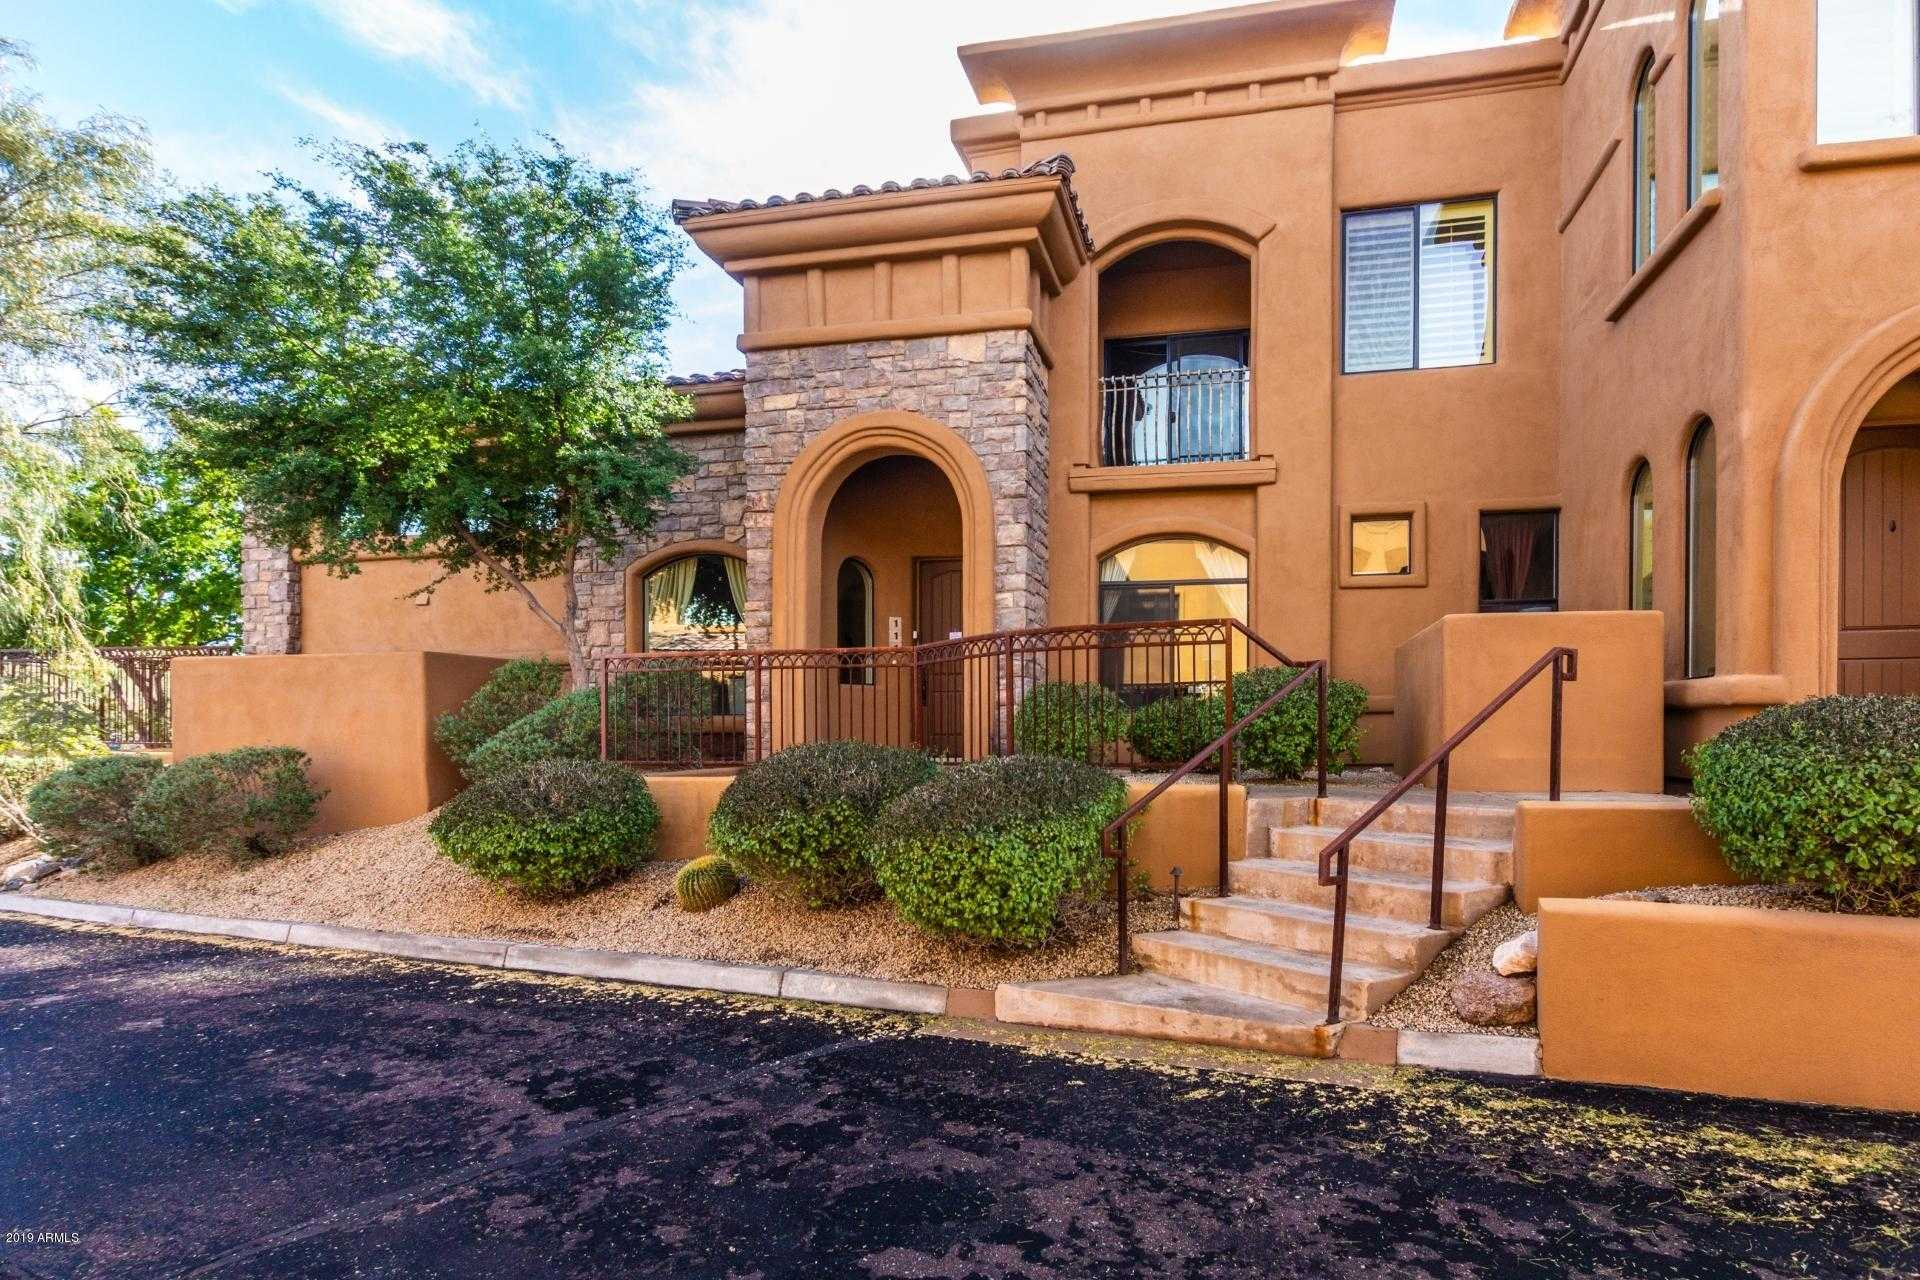 $535,000 - 3Br/3Ba -  for Sale in Montacino Carefree Condominium, Carefree